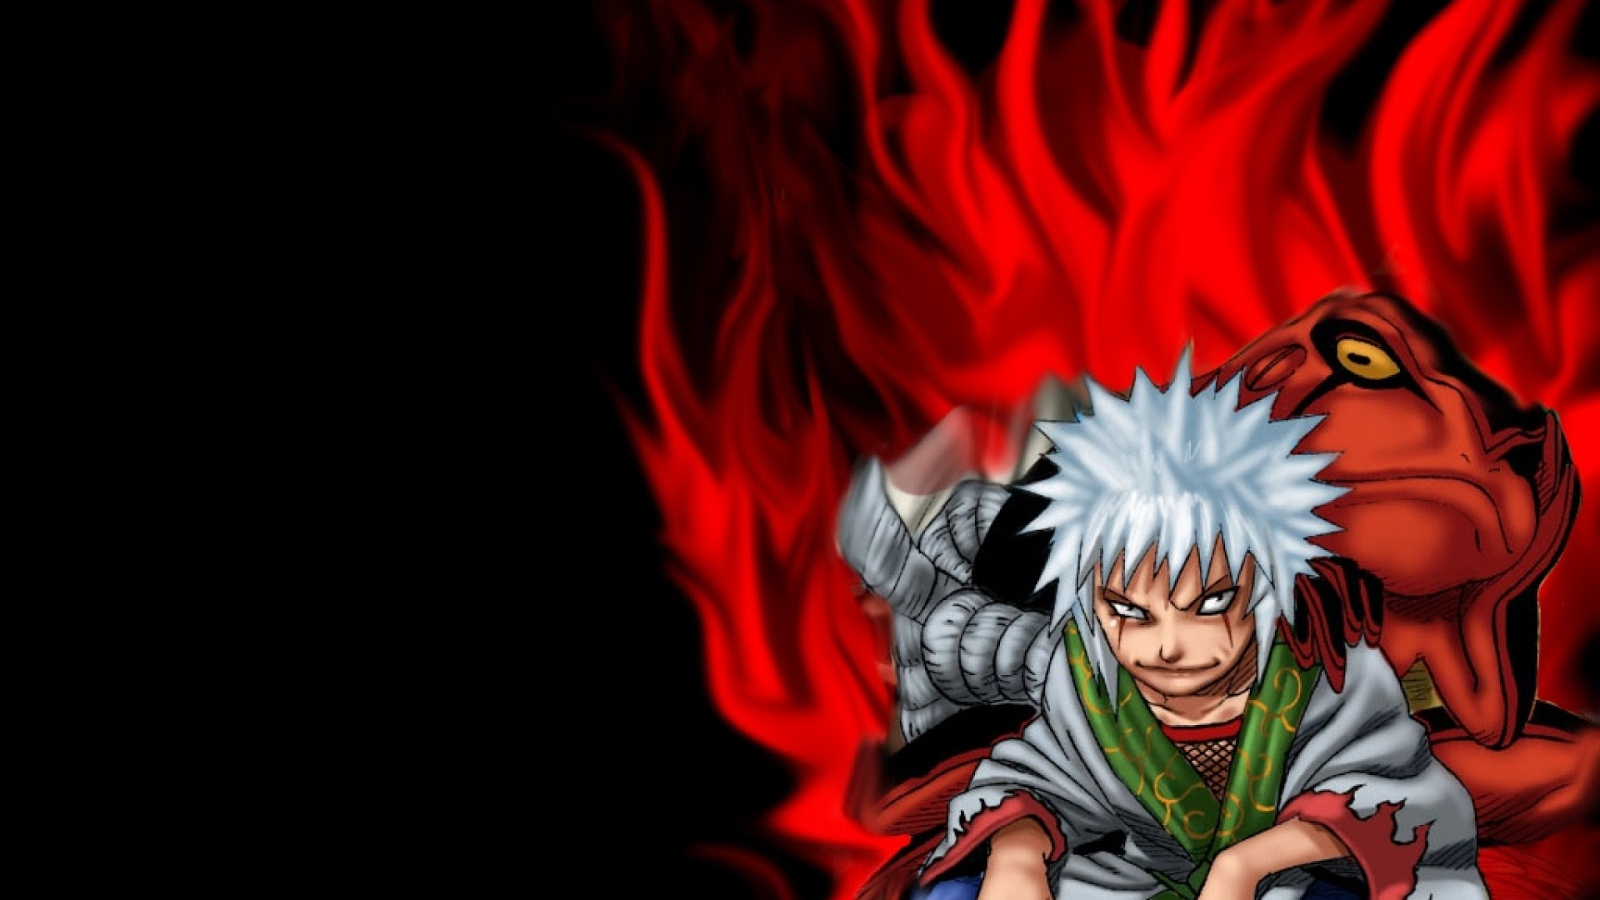 Free Download Cool Naruto Anime Wallpaper High Quality Wallpaper Images 1080p Hd 1600x1000 For Your Desktop Mobile Tablet Explore 47 1080p Naruto Wallpaper Naruto Shippuden Wallpaper Naruto And Sasuke